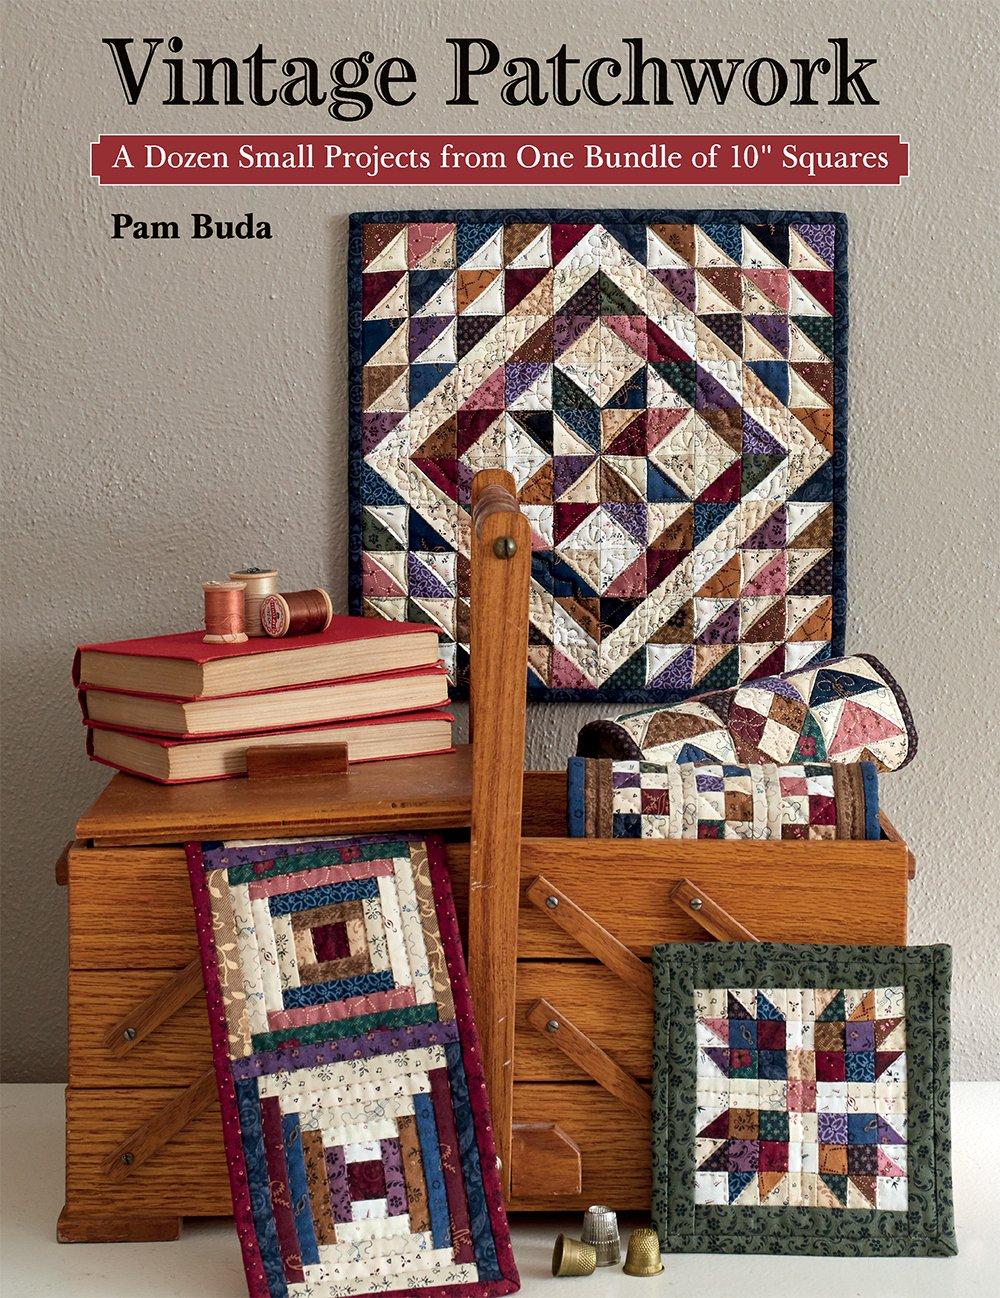 Vintage Patchwork Book & Fabric Precut